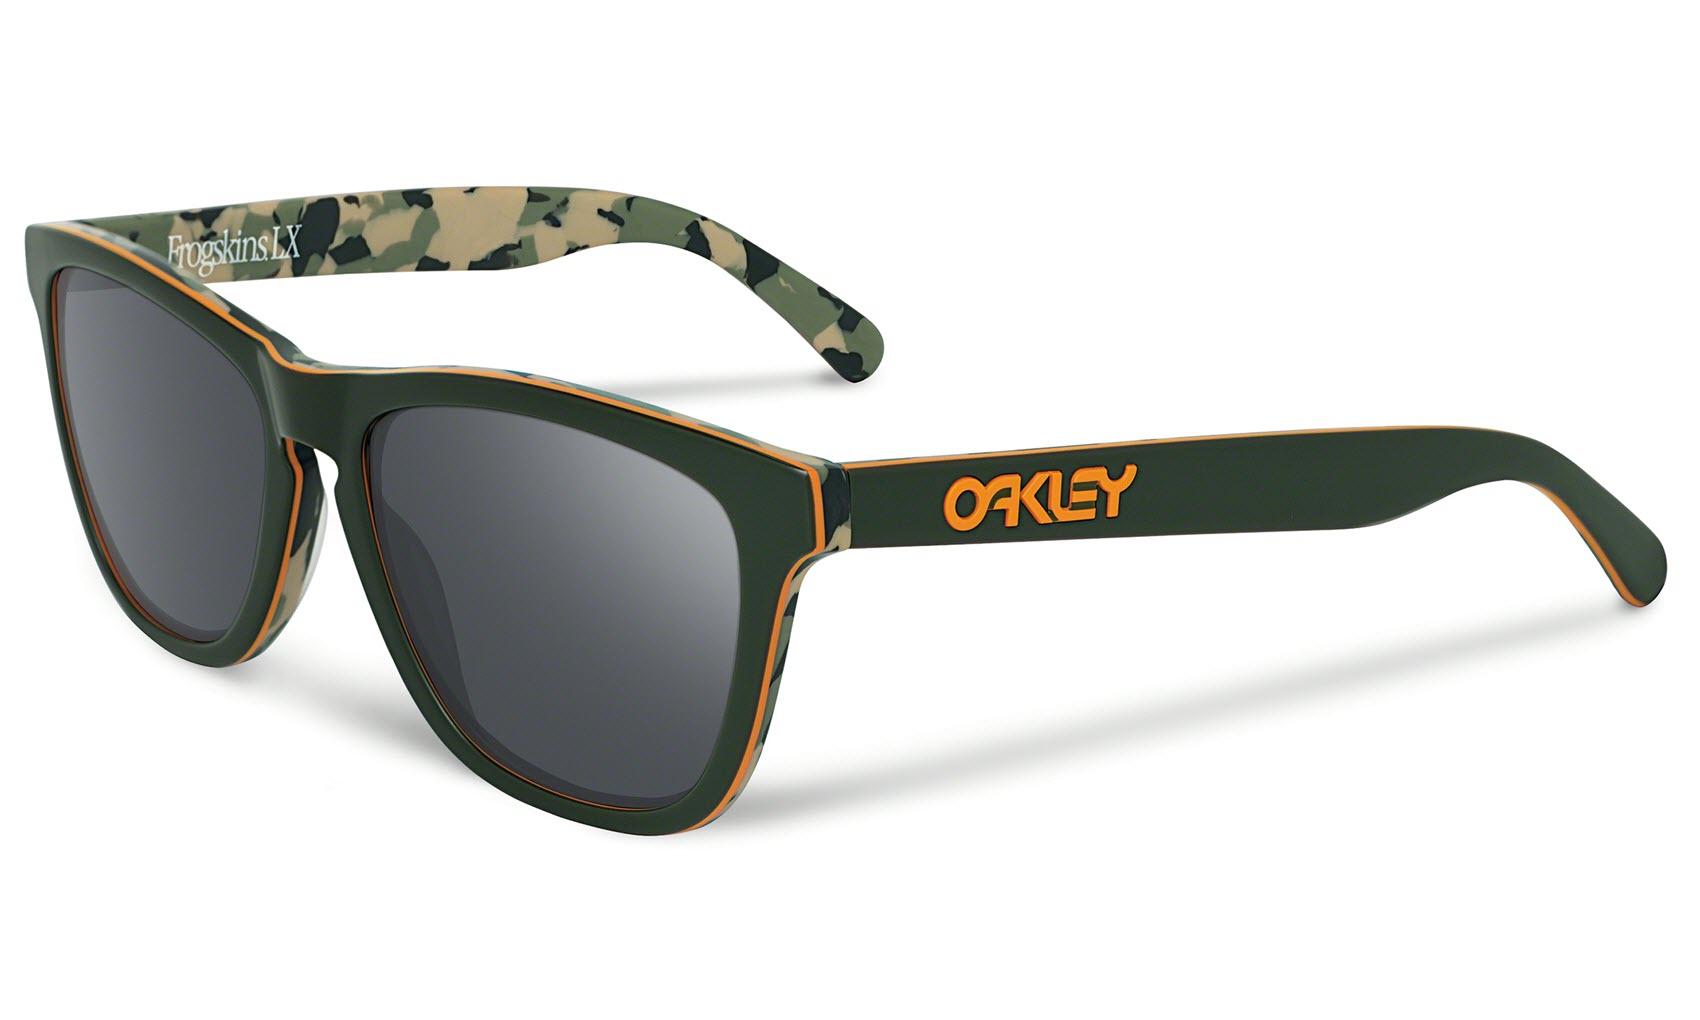 082e7d054f1 Oakley Frogskins Lx Sunglasses « Heritage Malta